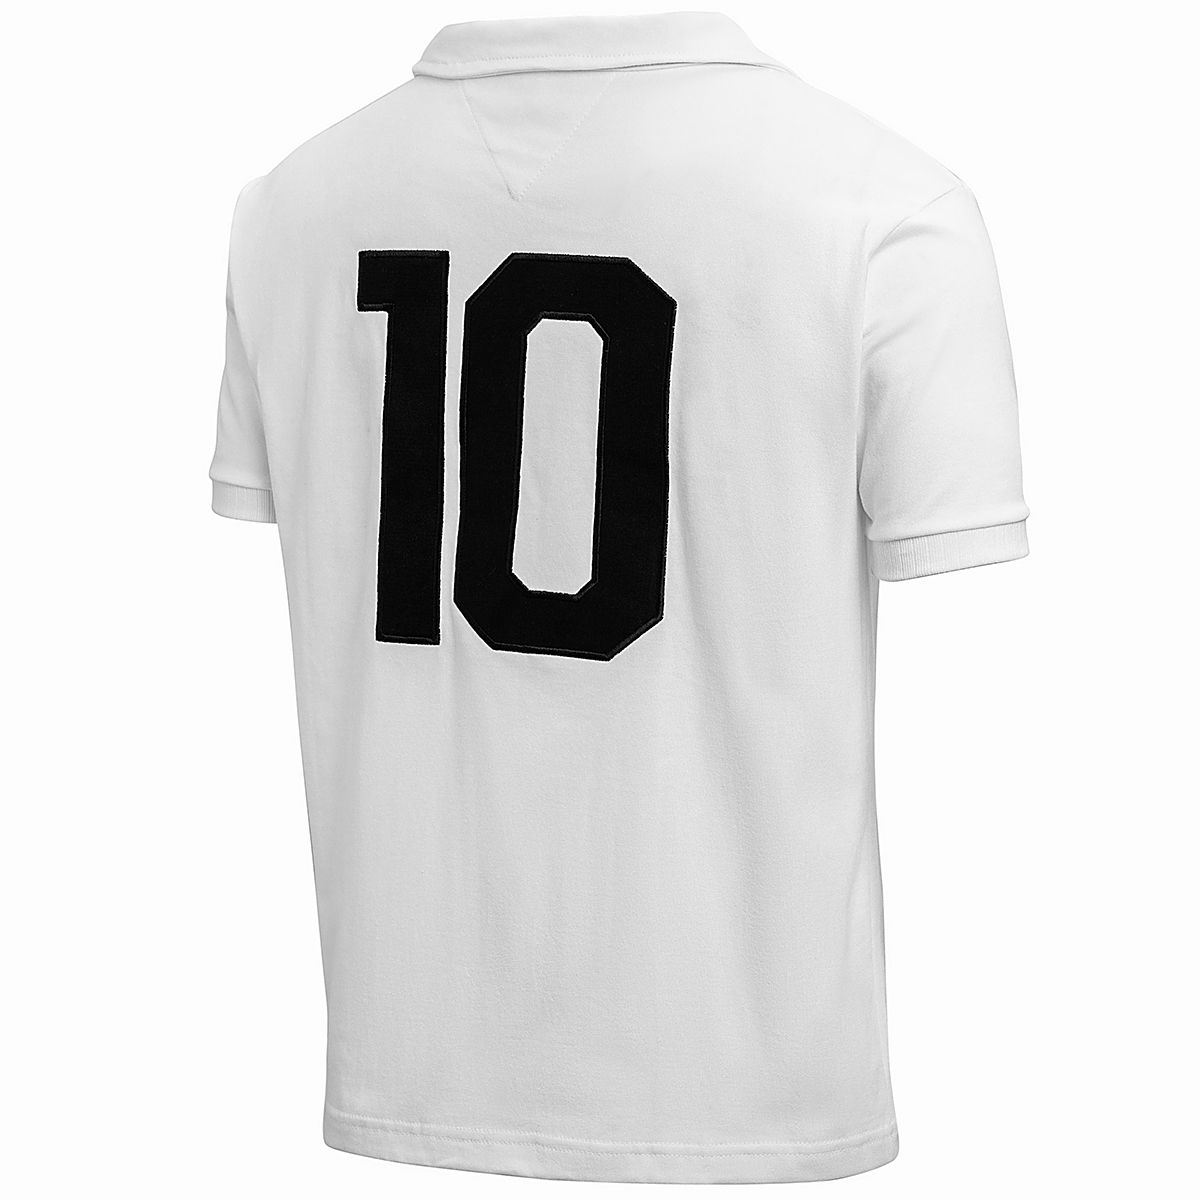 Camisa Santos Retrô 1962 Masculina